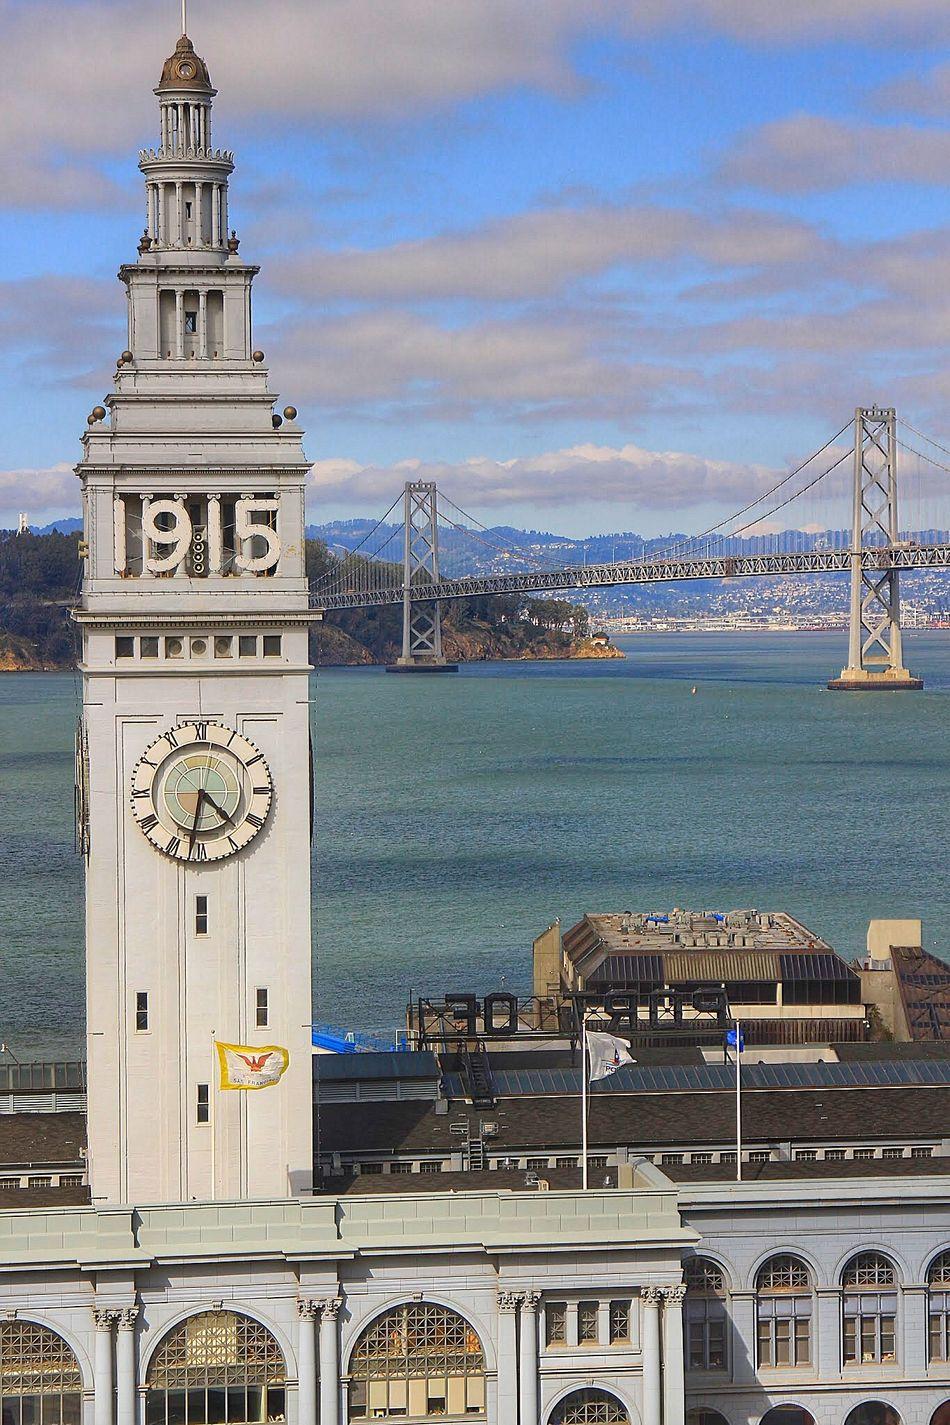 San Francisco Embarcadero Port San Francisco Bay Bridge San Francisco Bay View Tower Waterfront Cityscape Pier